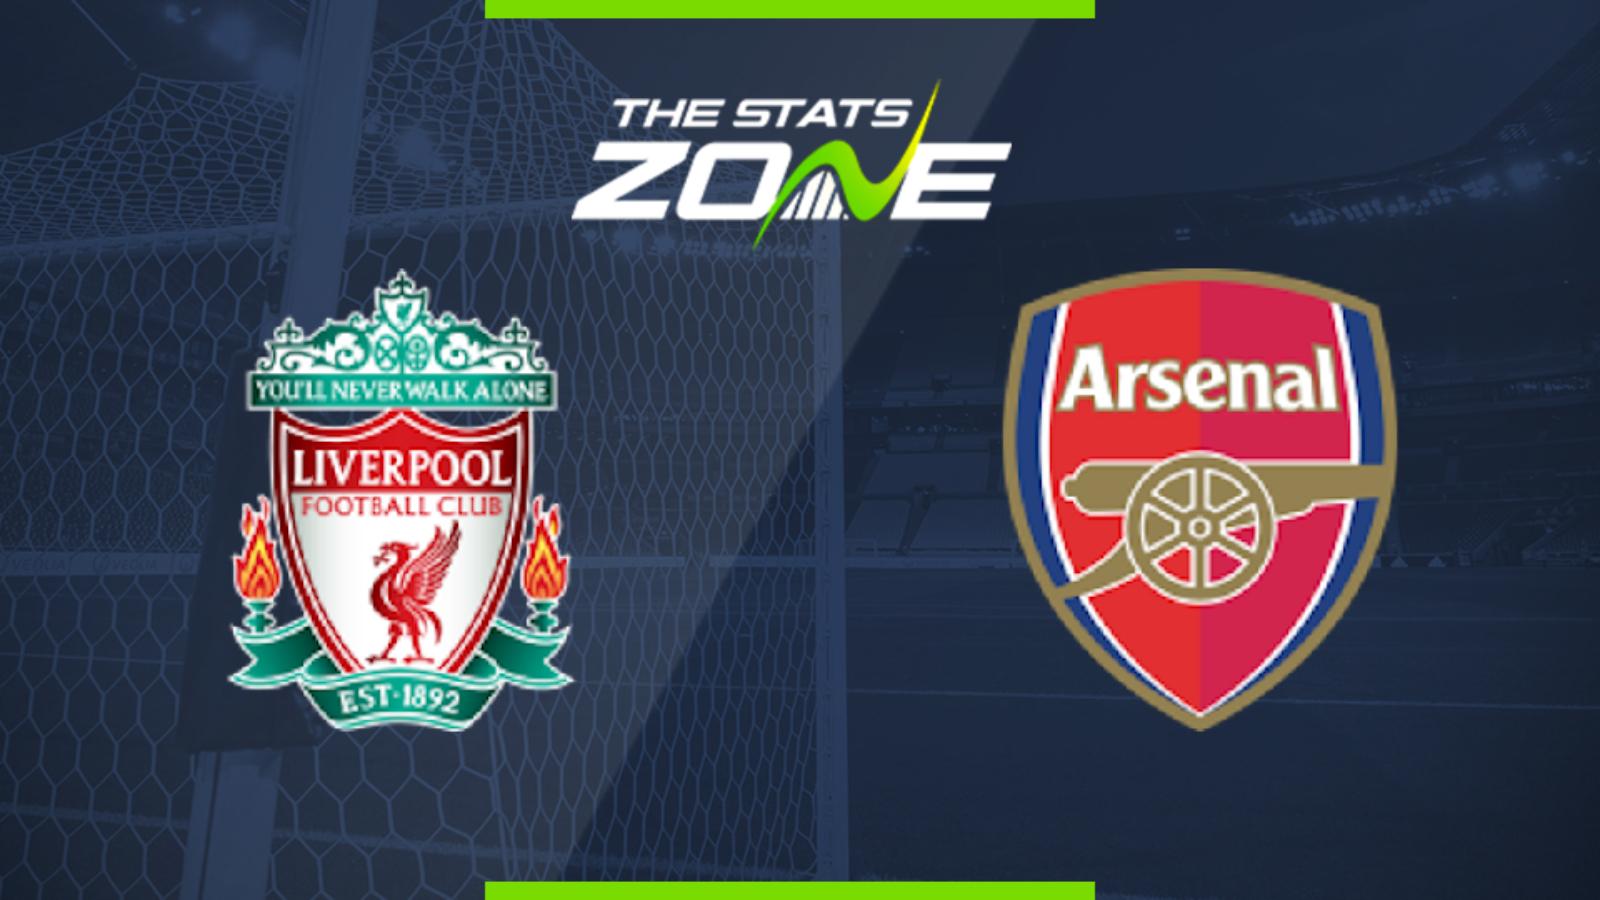 Premier League 2019 20 Liverpool Vs Arsenal Preview Prediction The Stats Zone